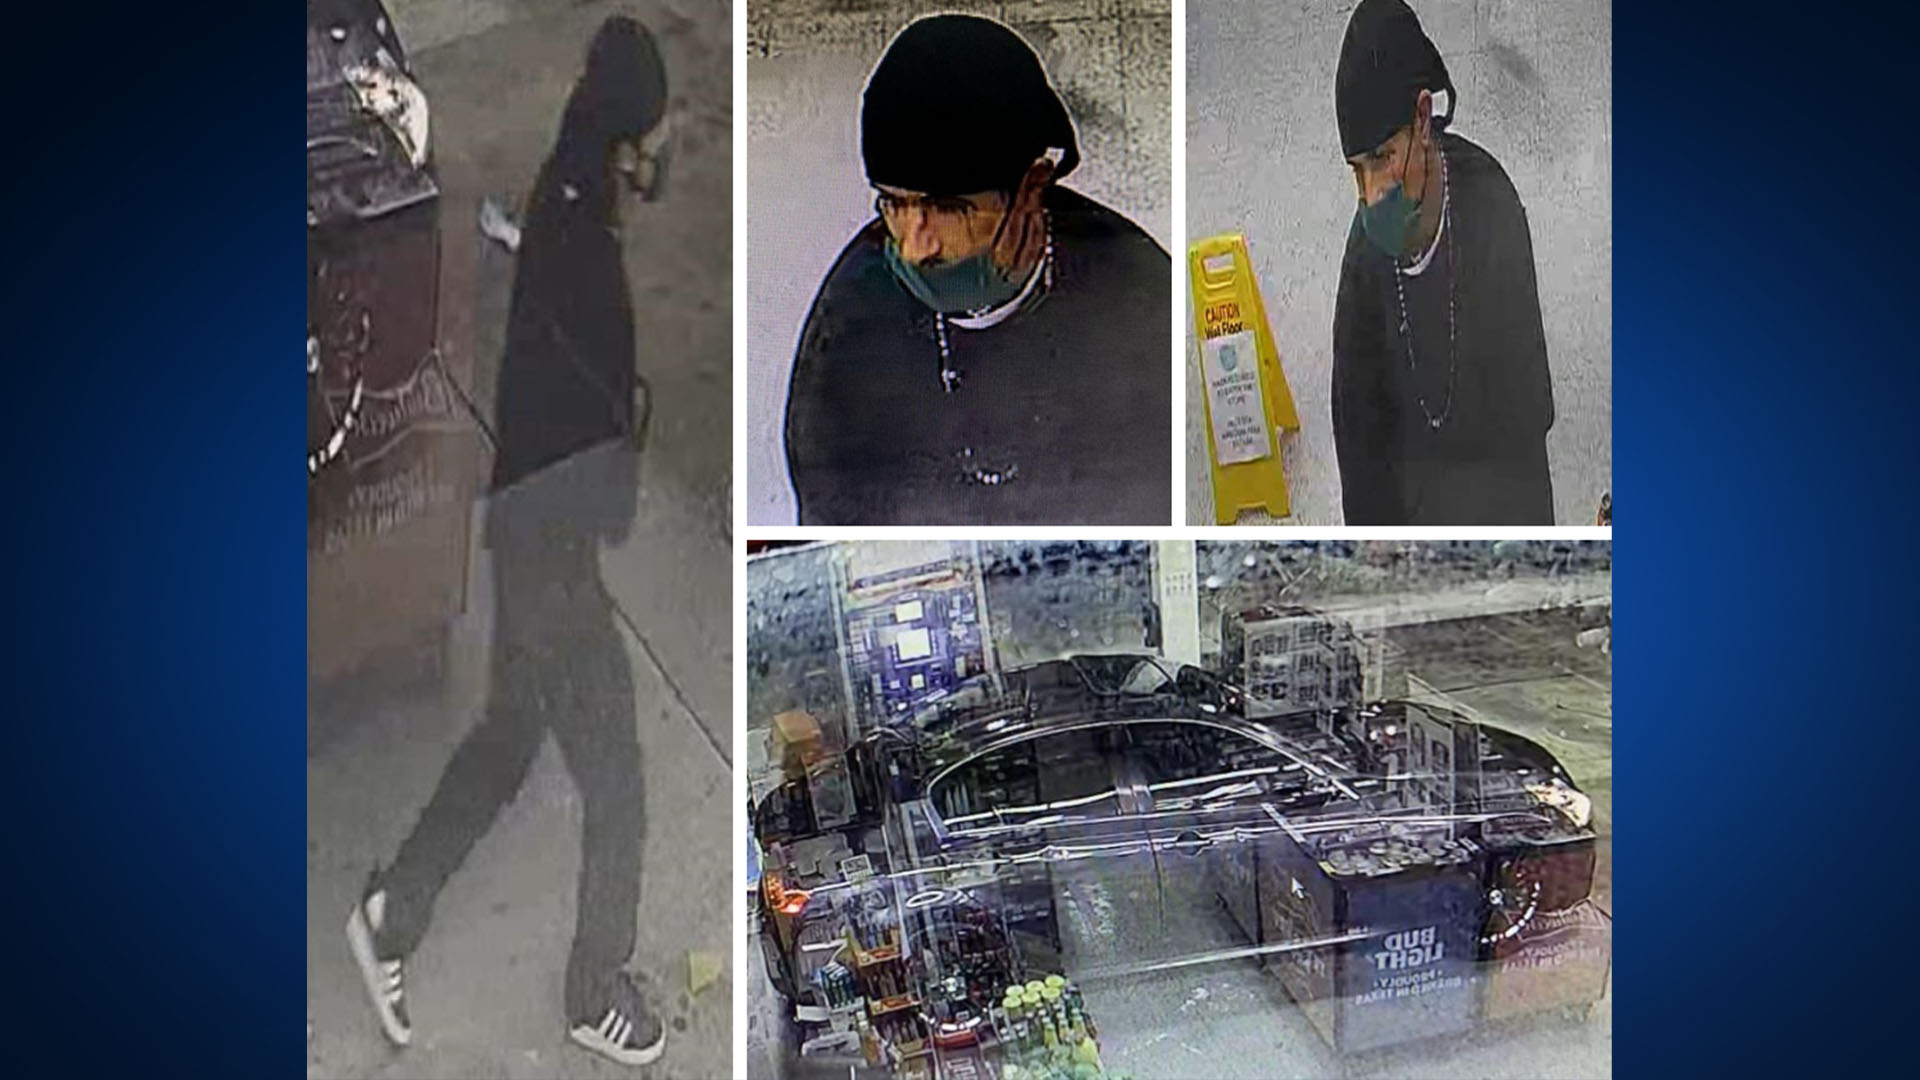 Suspect accused in Dec. 7 Exxon robbery (APD Photo)